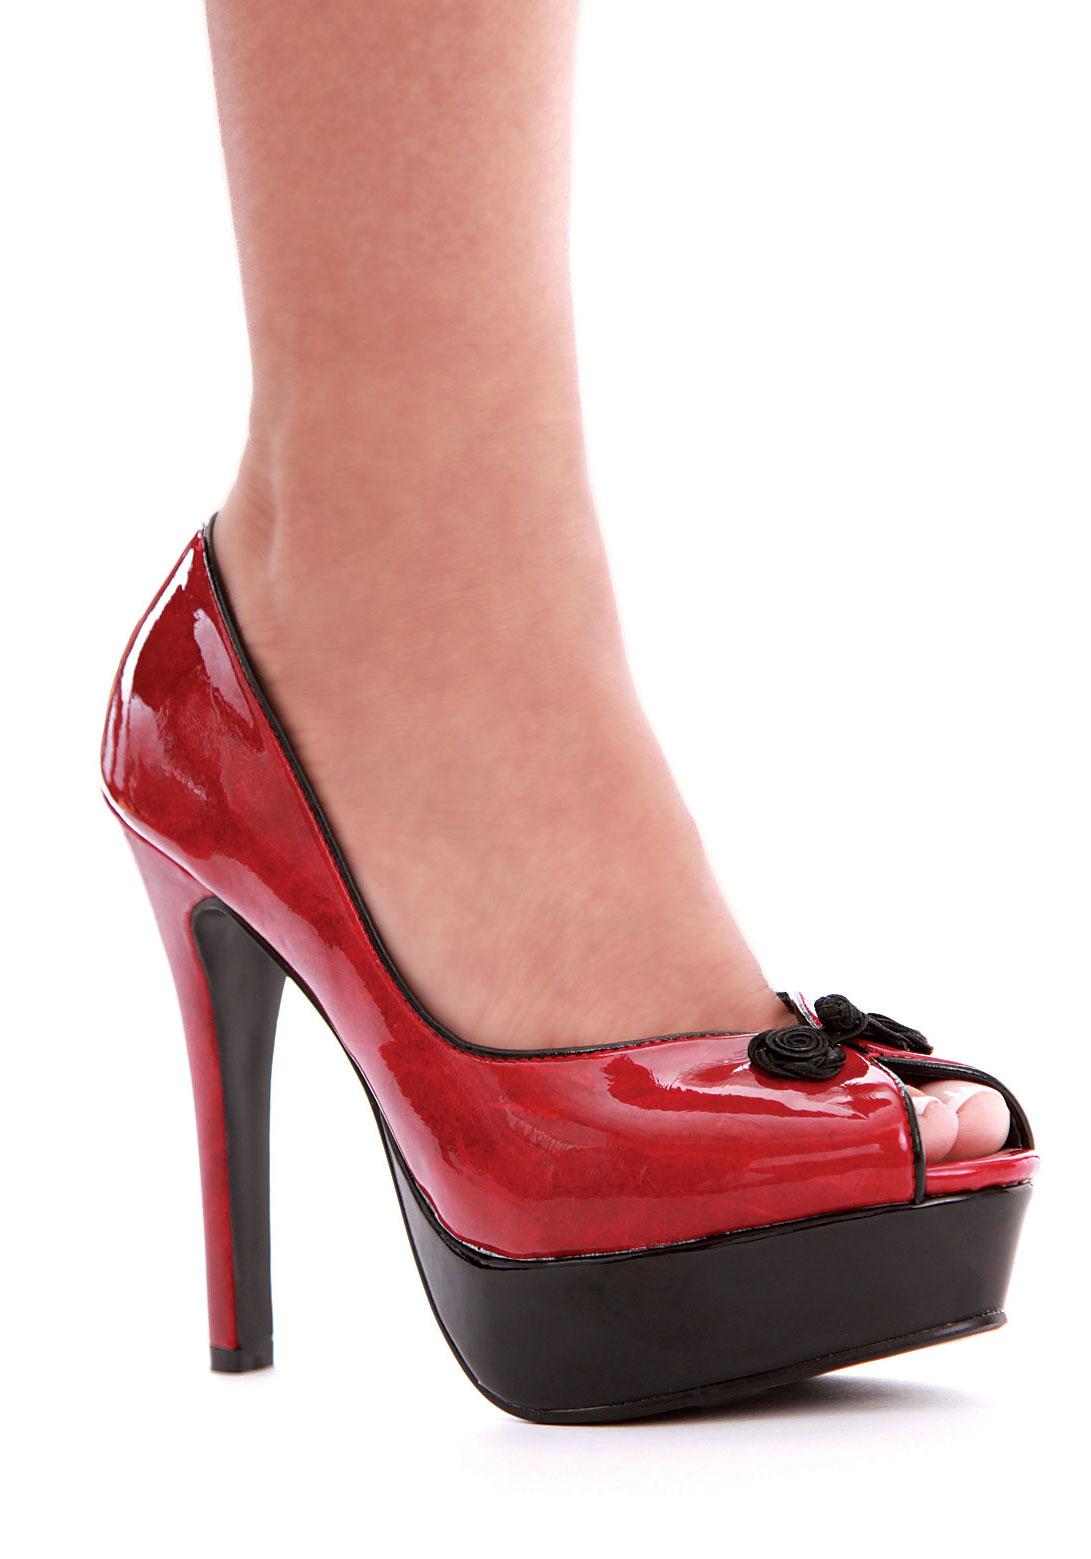 ellie shoes 523 greta greta 6 peeptoe with 2 inch